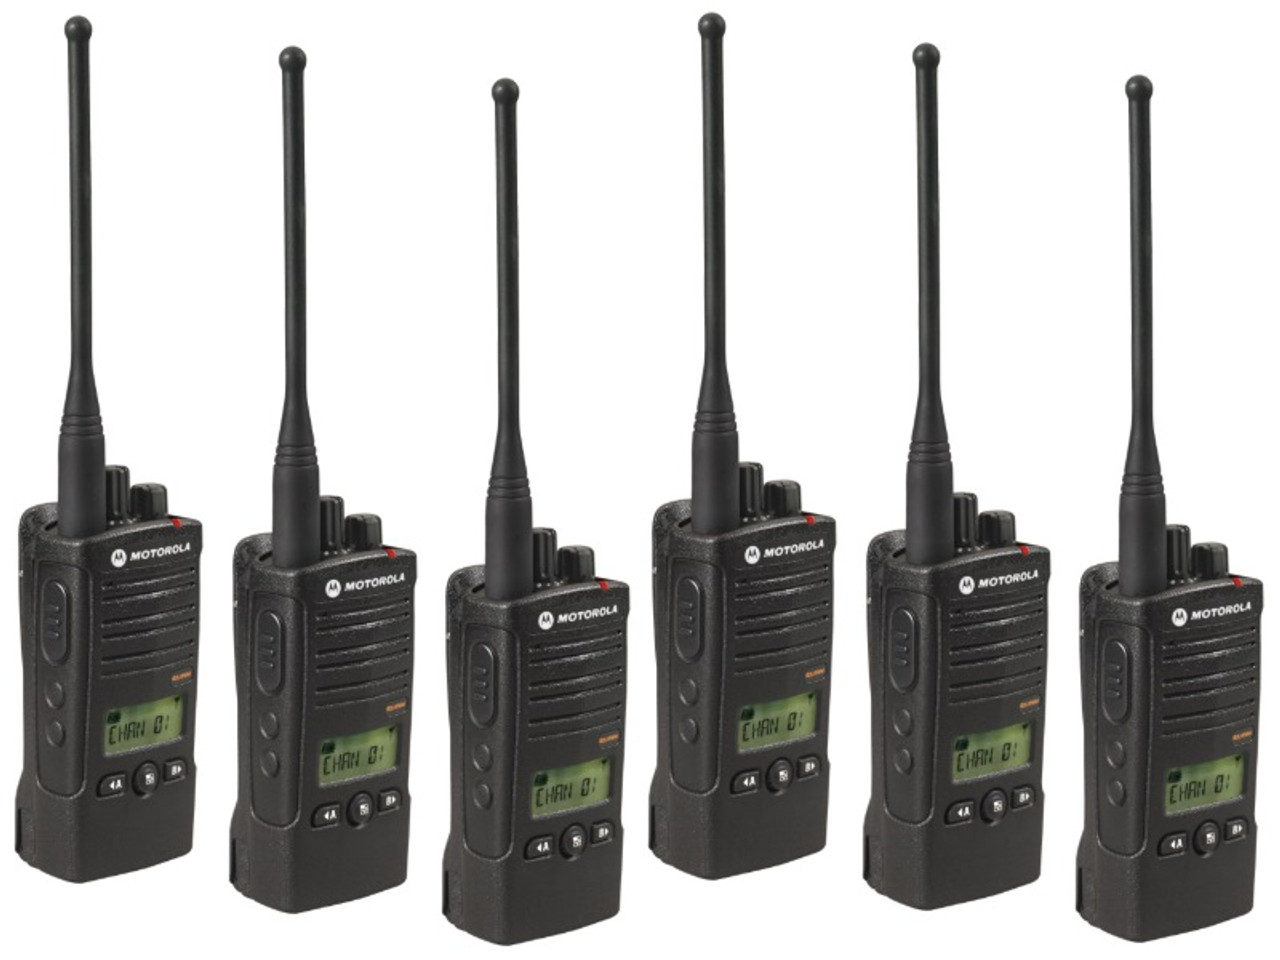 Motorola RDU4160D Six Pack of 4 Watt 16 Channel UHF Radios